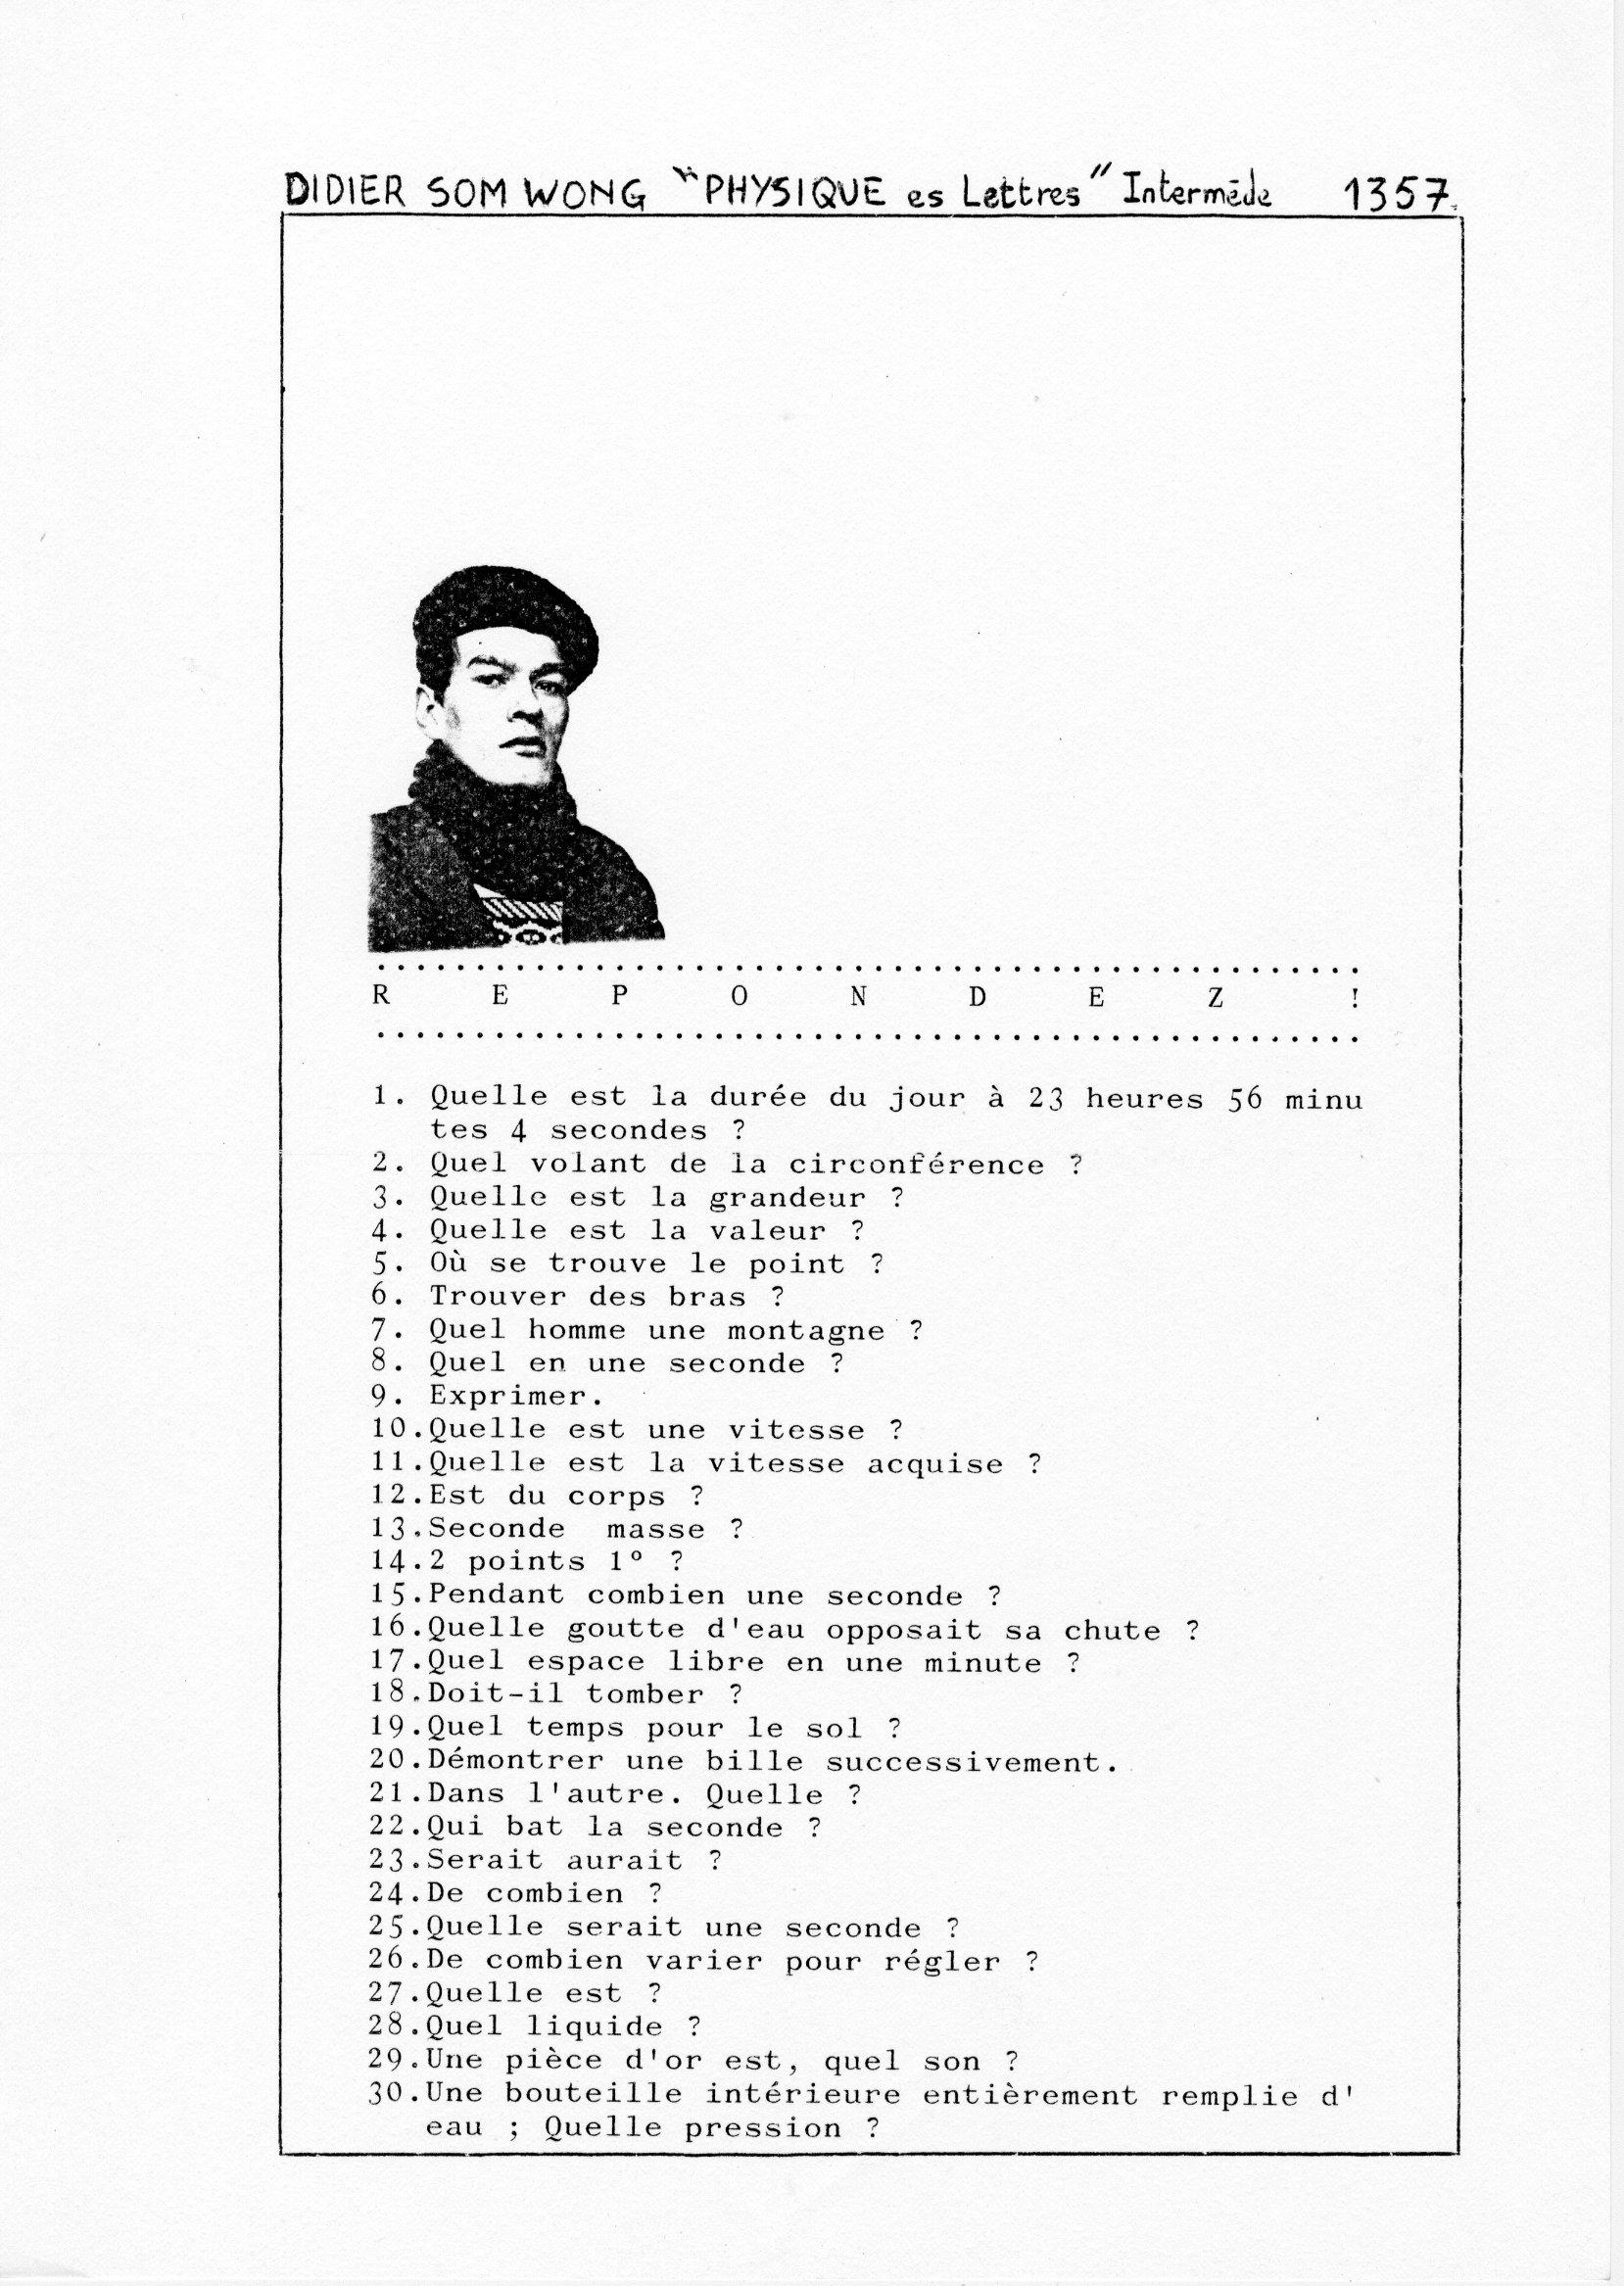 page 1357 D. Som Wong PHYSIQUE Es Lettres -Intermède-